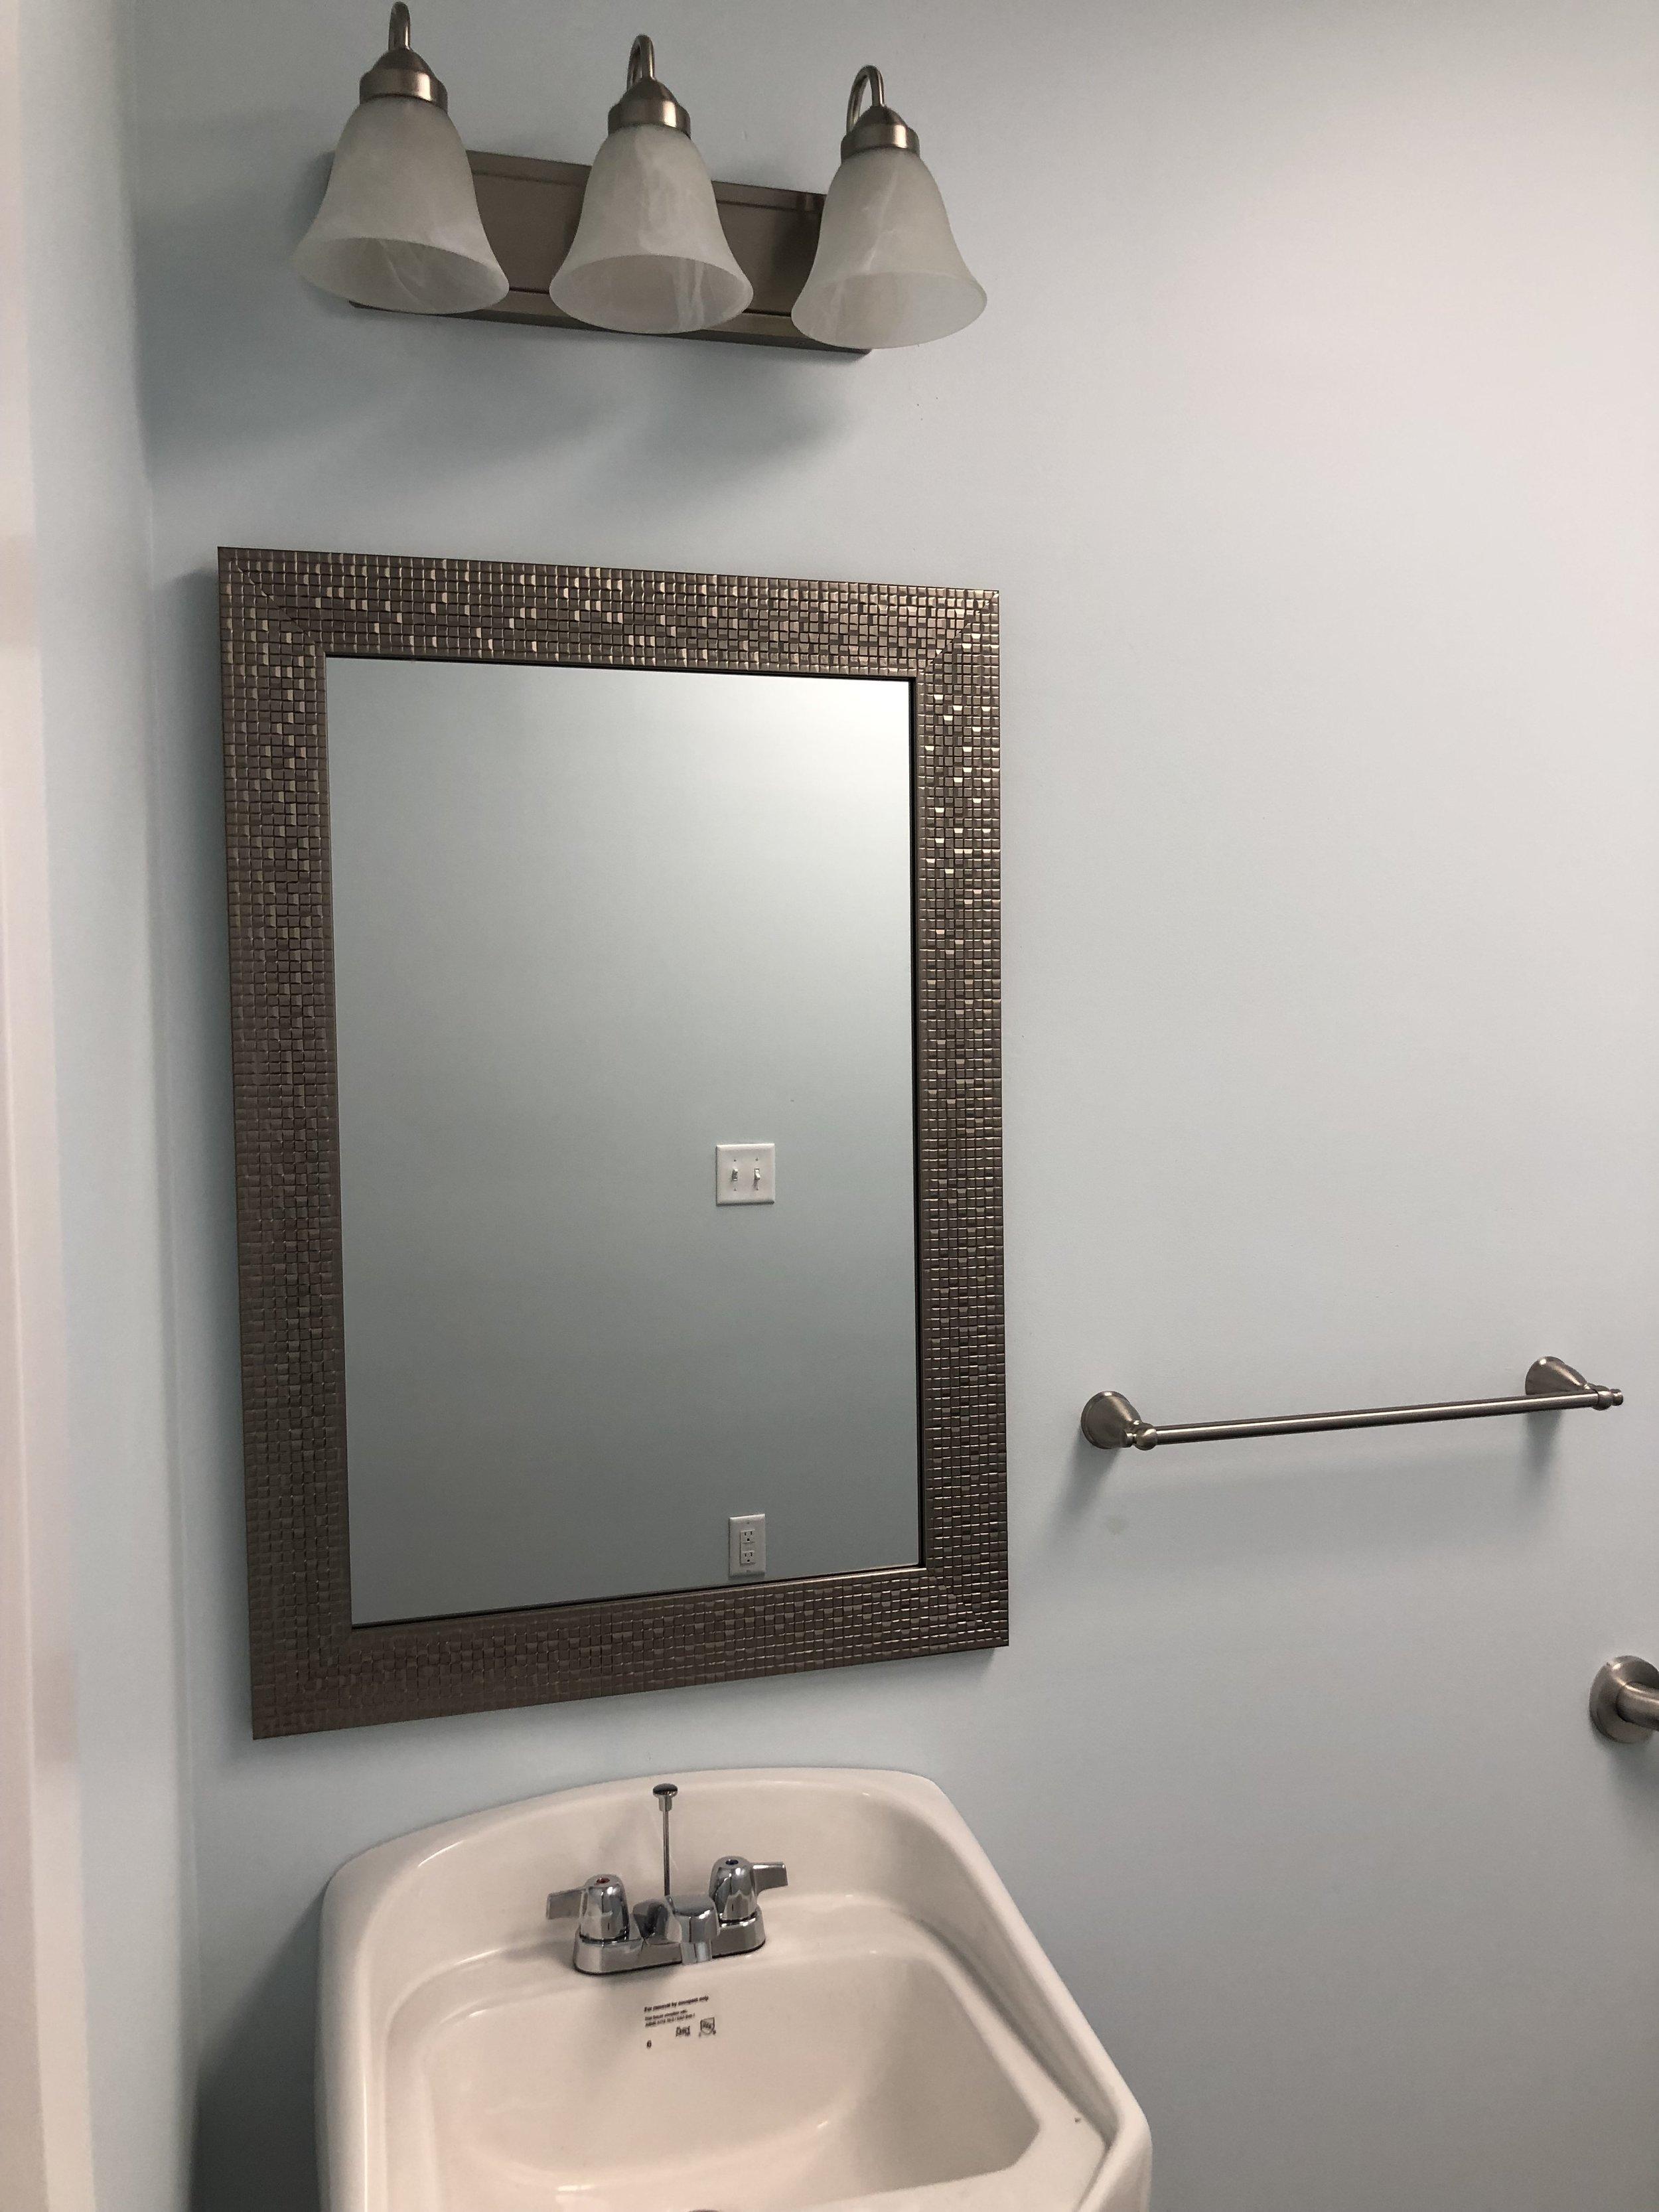 Bathroom sink, mirror, and vanity light in place.